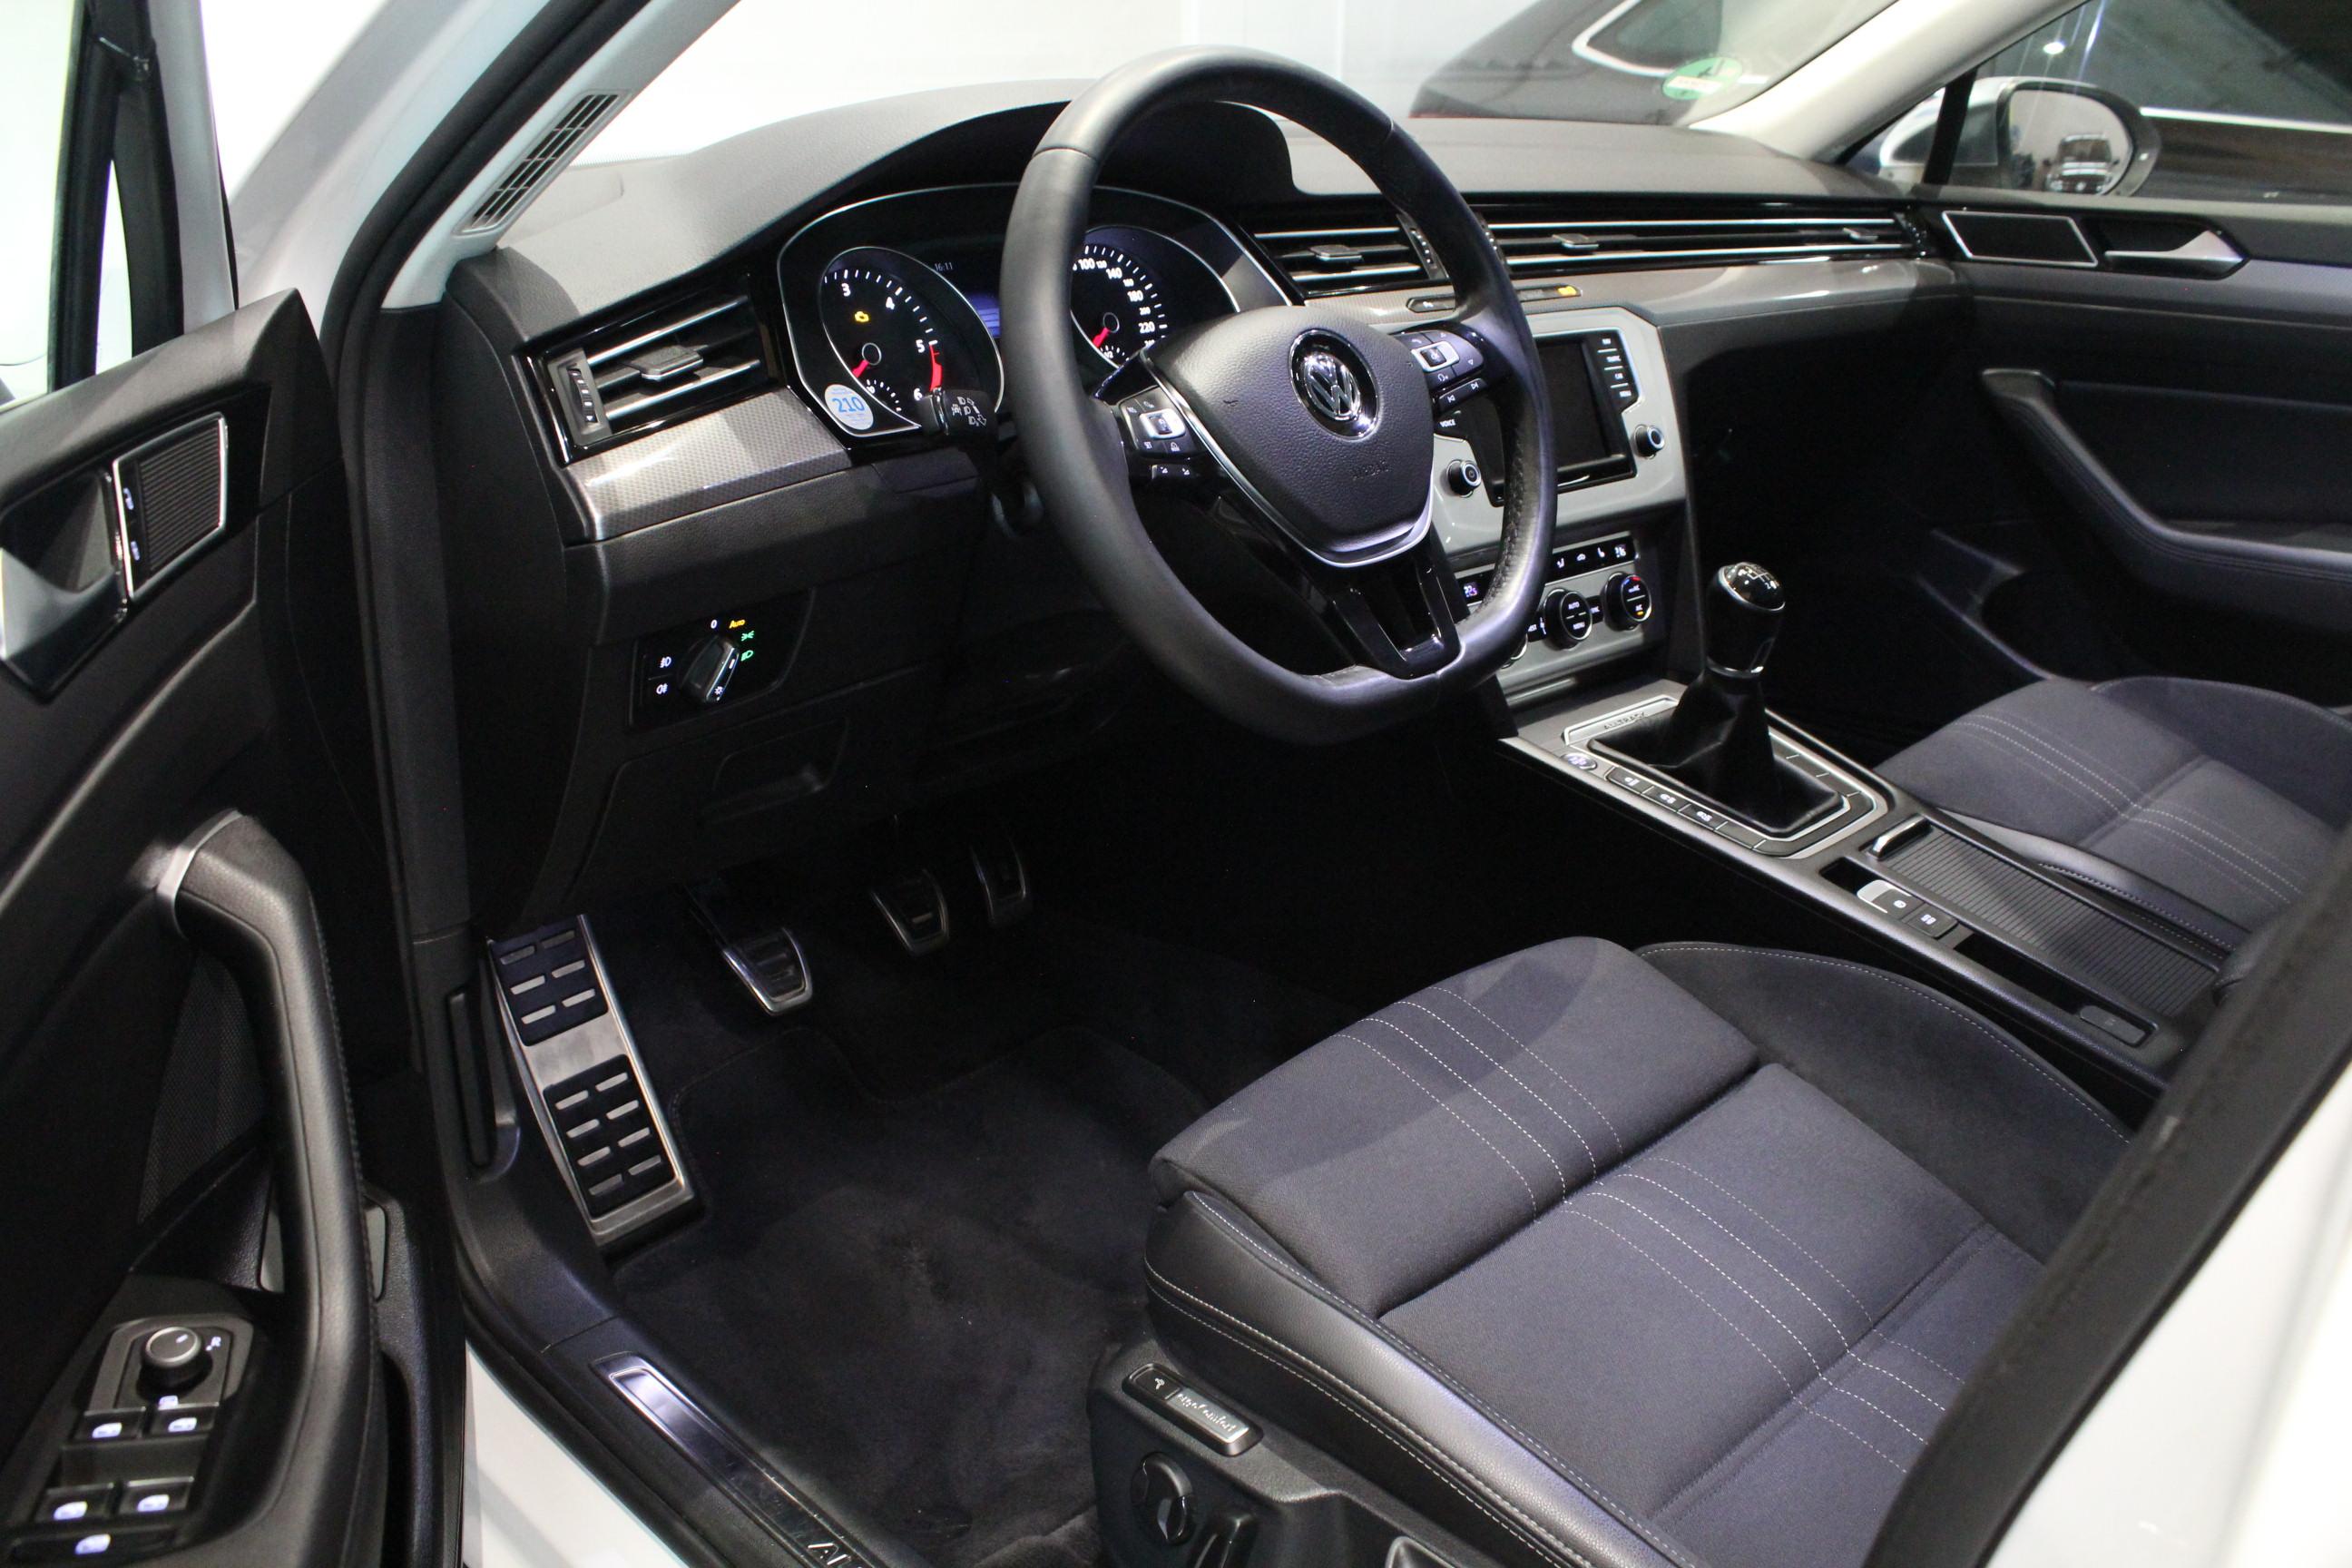 VW Passat B8 2.0 TDI Alltrack 4Motion FULL LED Highline - AutoBrela obrázek